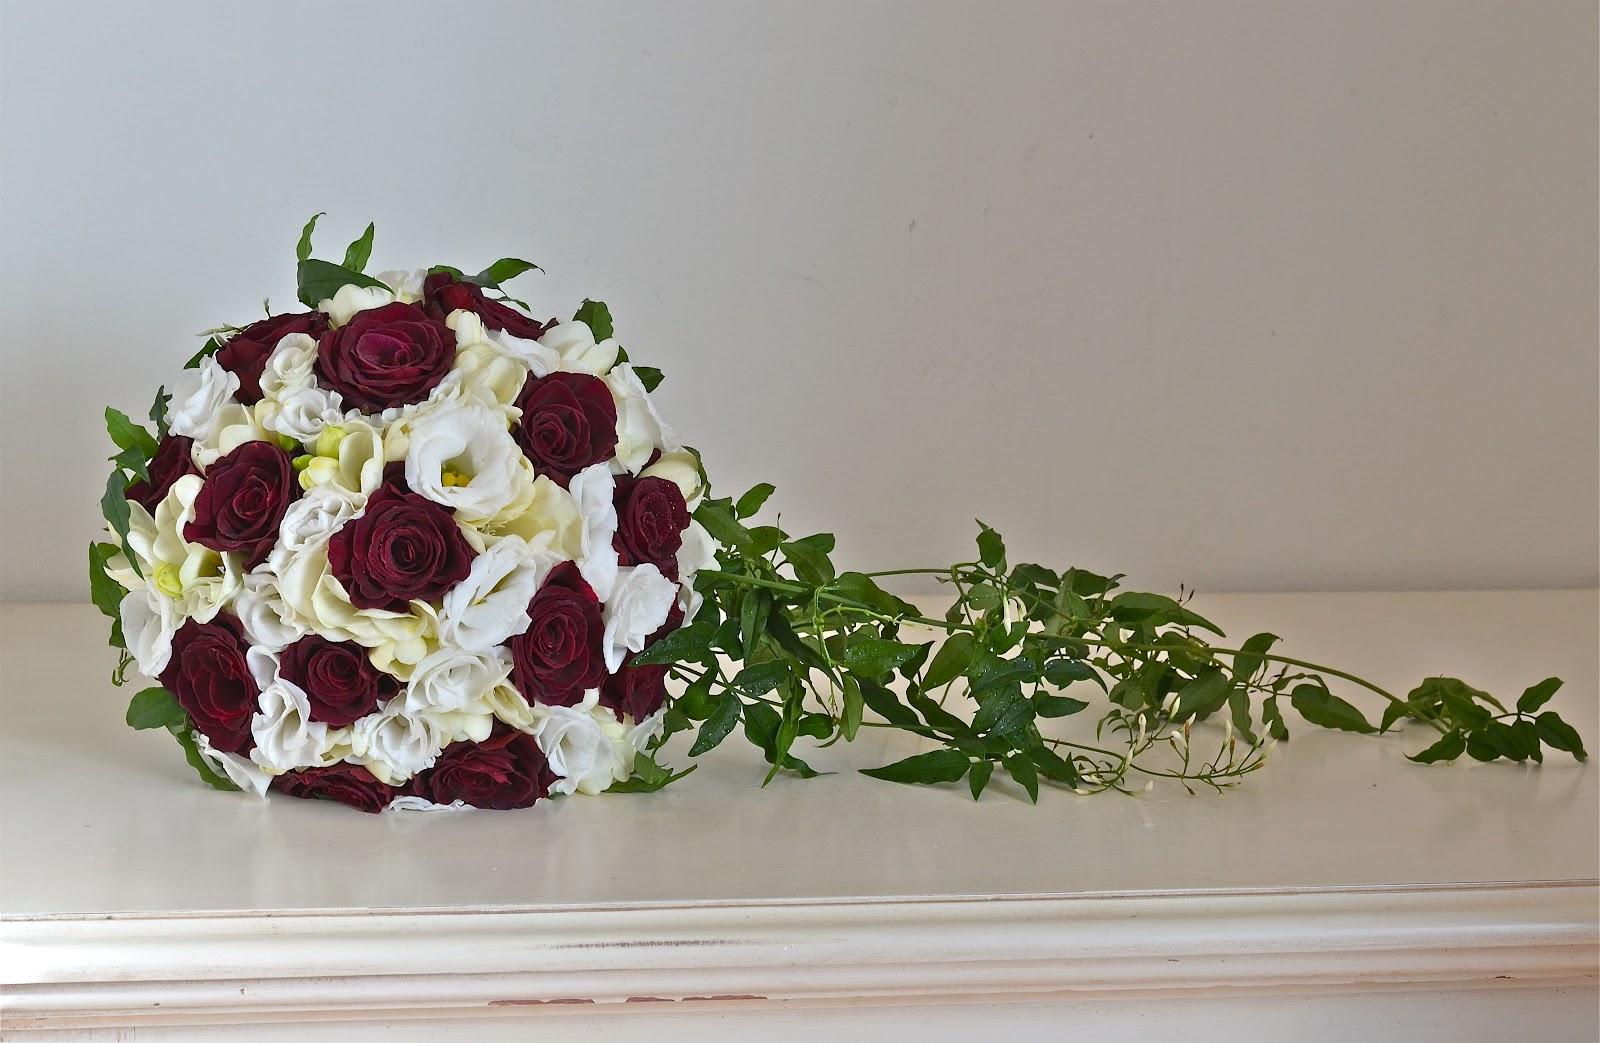 Wedding flowers blog tas burgundy and white wedding flowers wedding flowers blog tas burgundy and white wedding flowers elmers court hotel izmirmasajfo